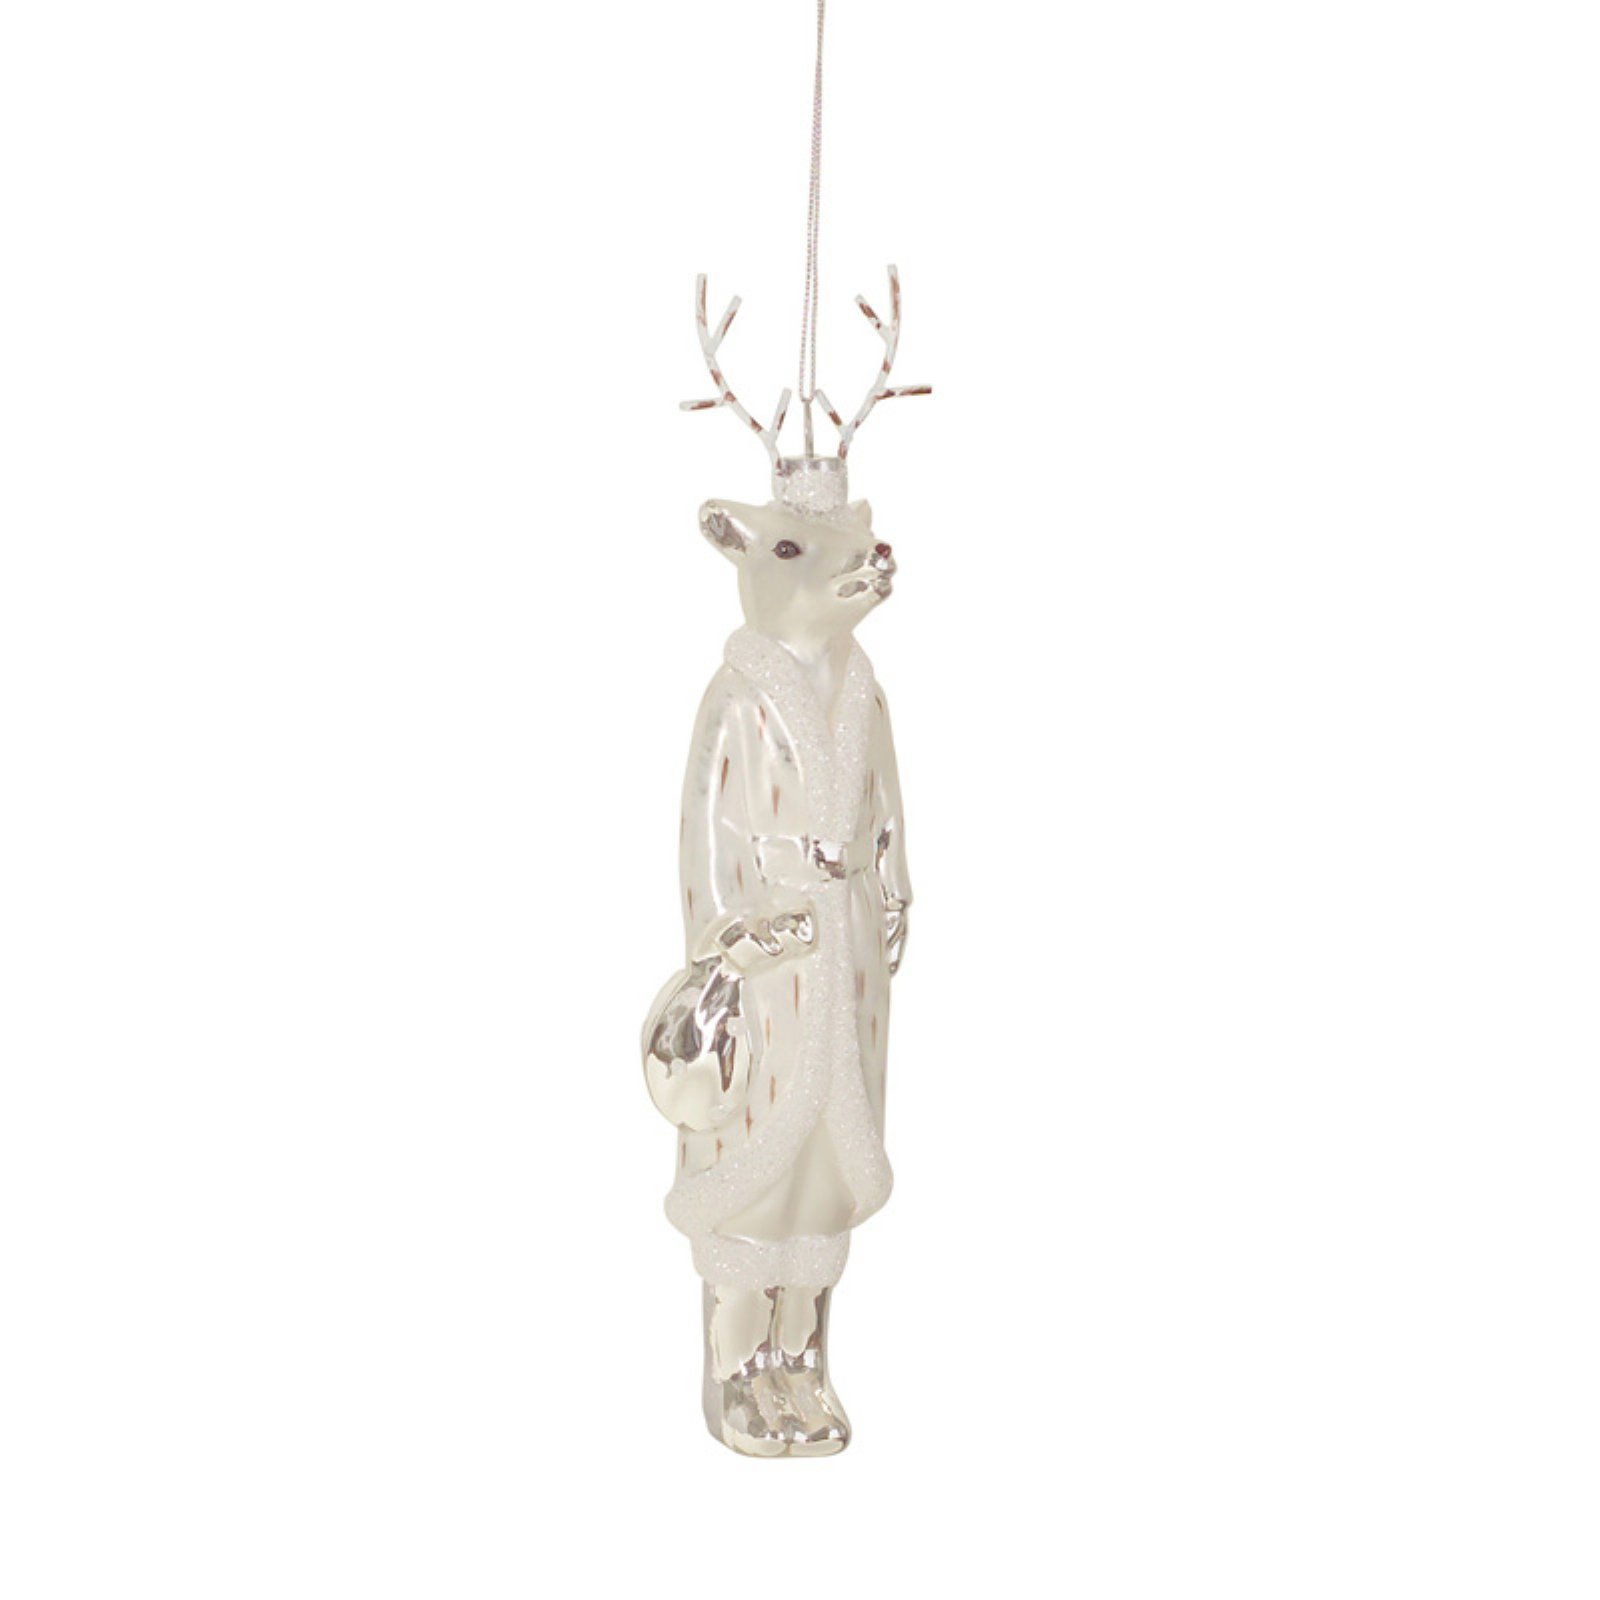 Melrose International Melrose 8.5 in. Tall Deer Glass Ornament